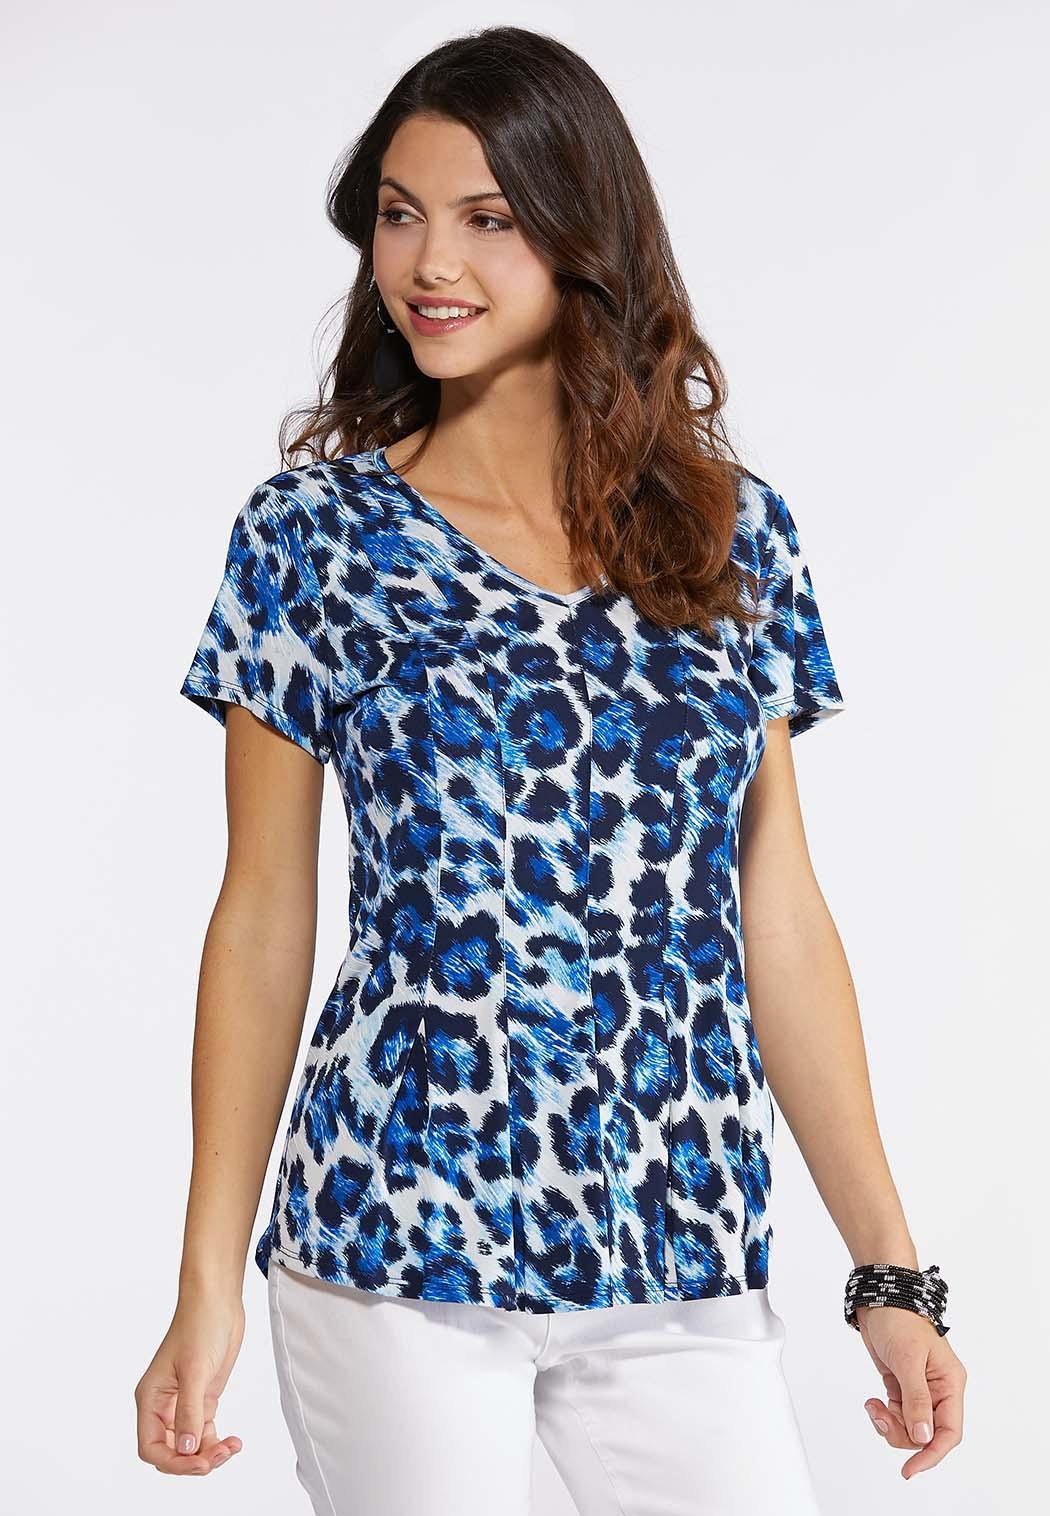 Blue Leopard Seamed Top